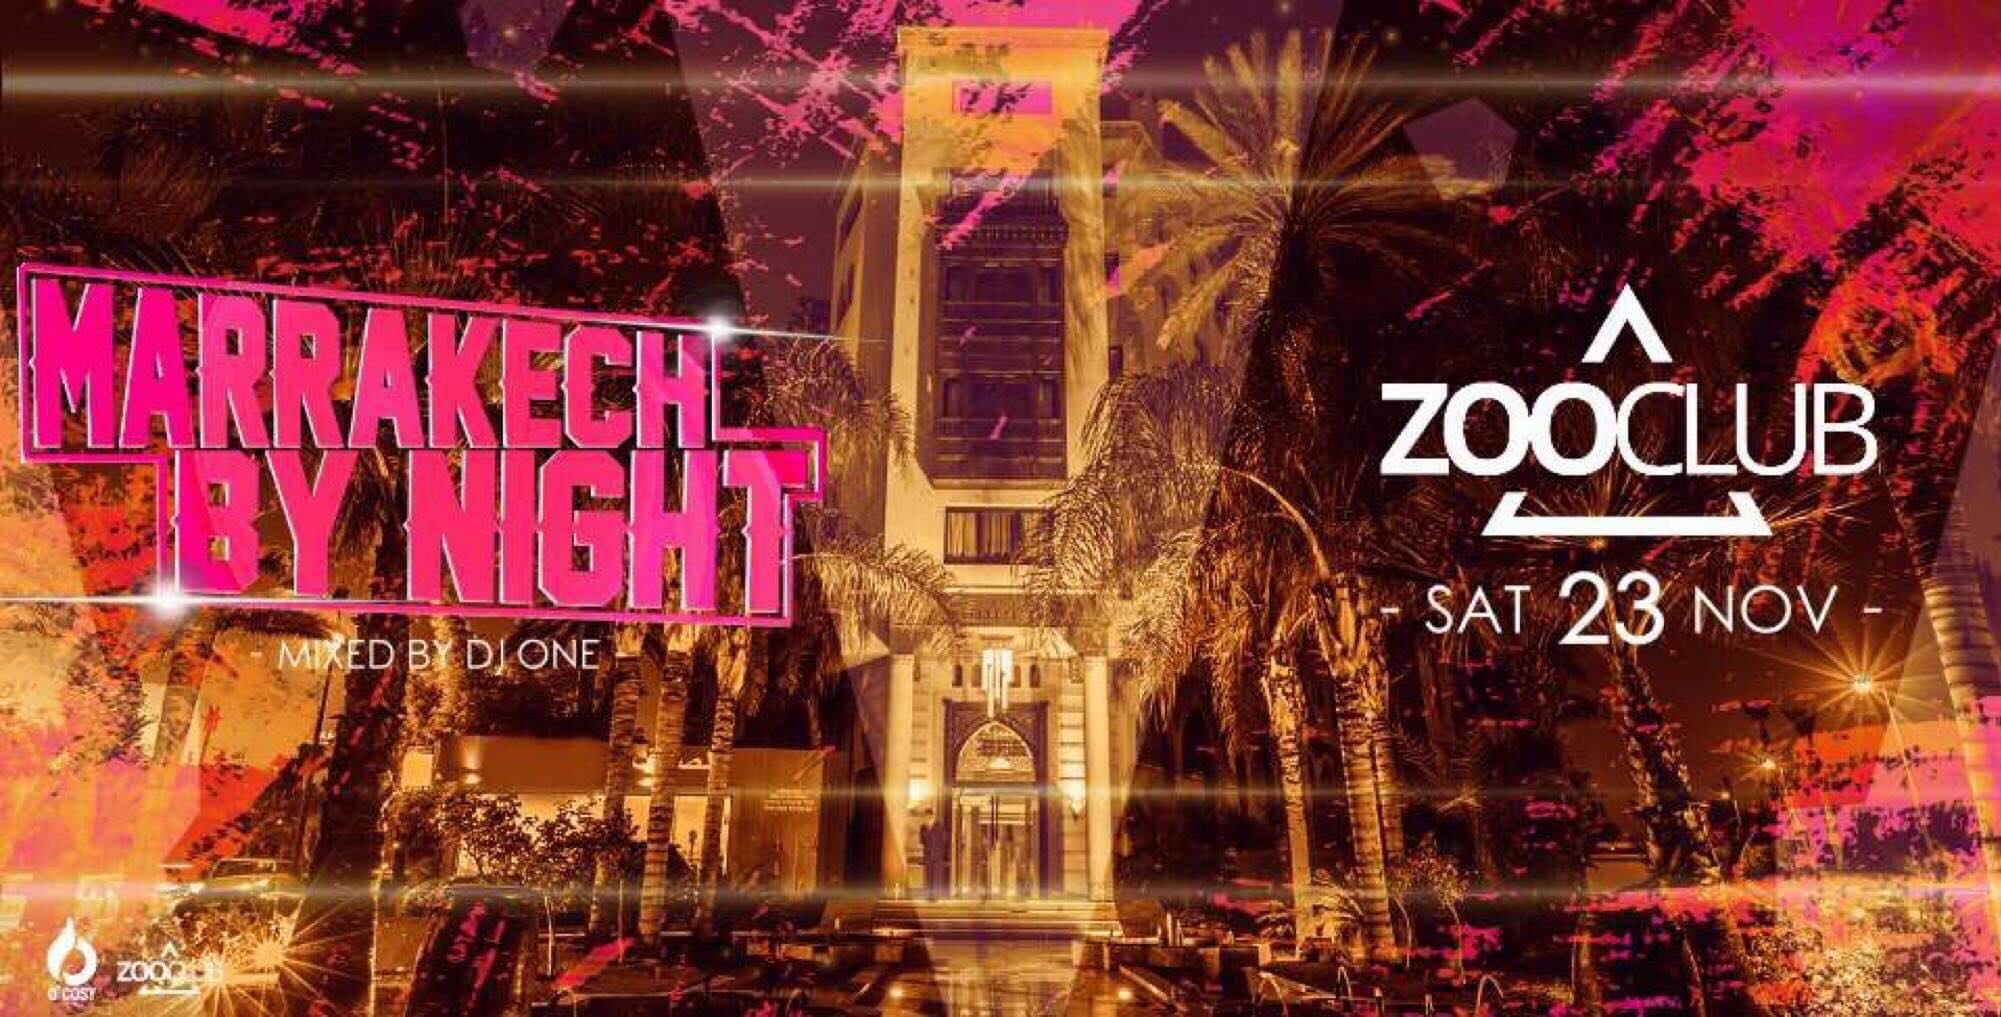 Marrakech by night au Zoo Club